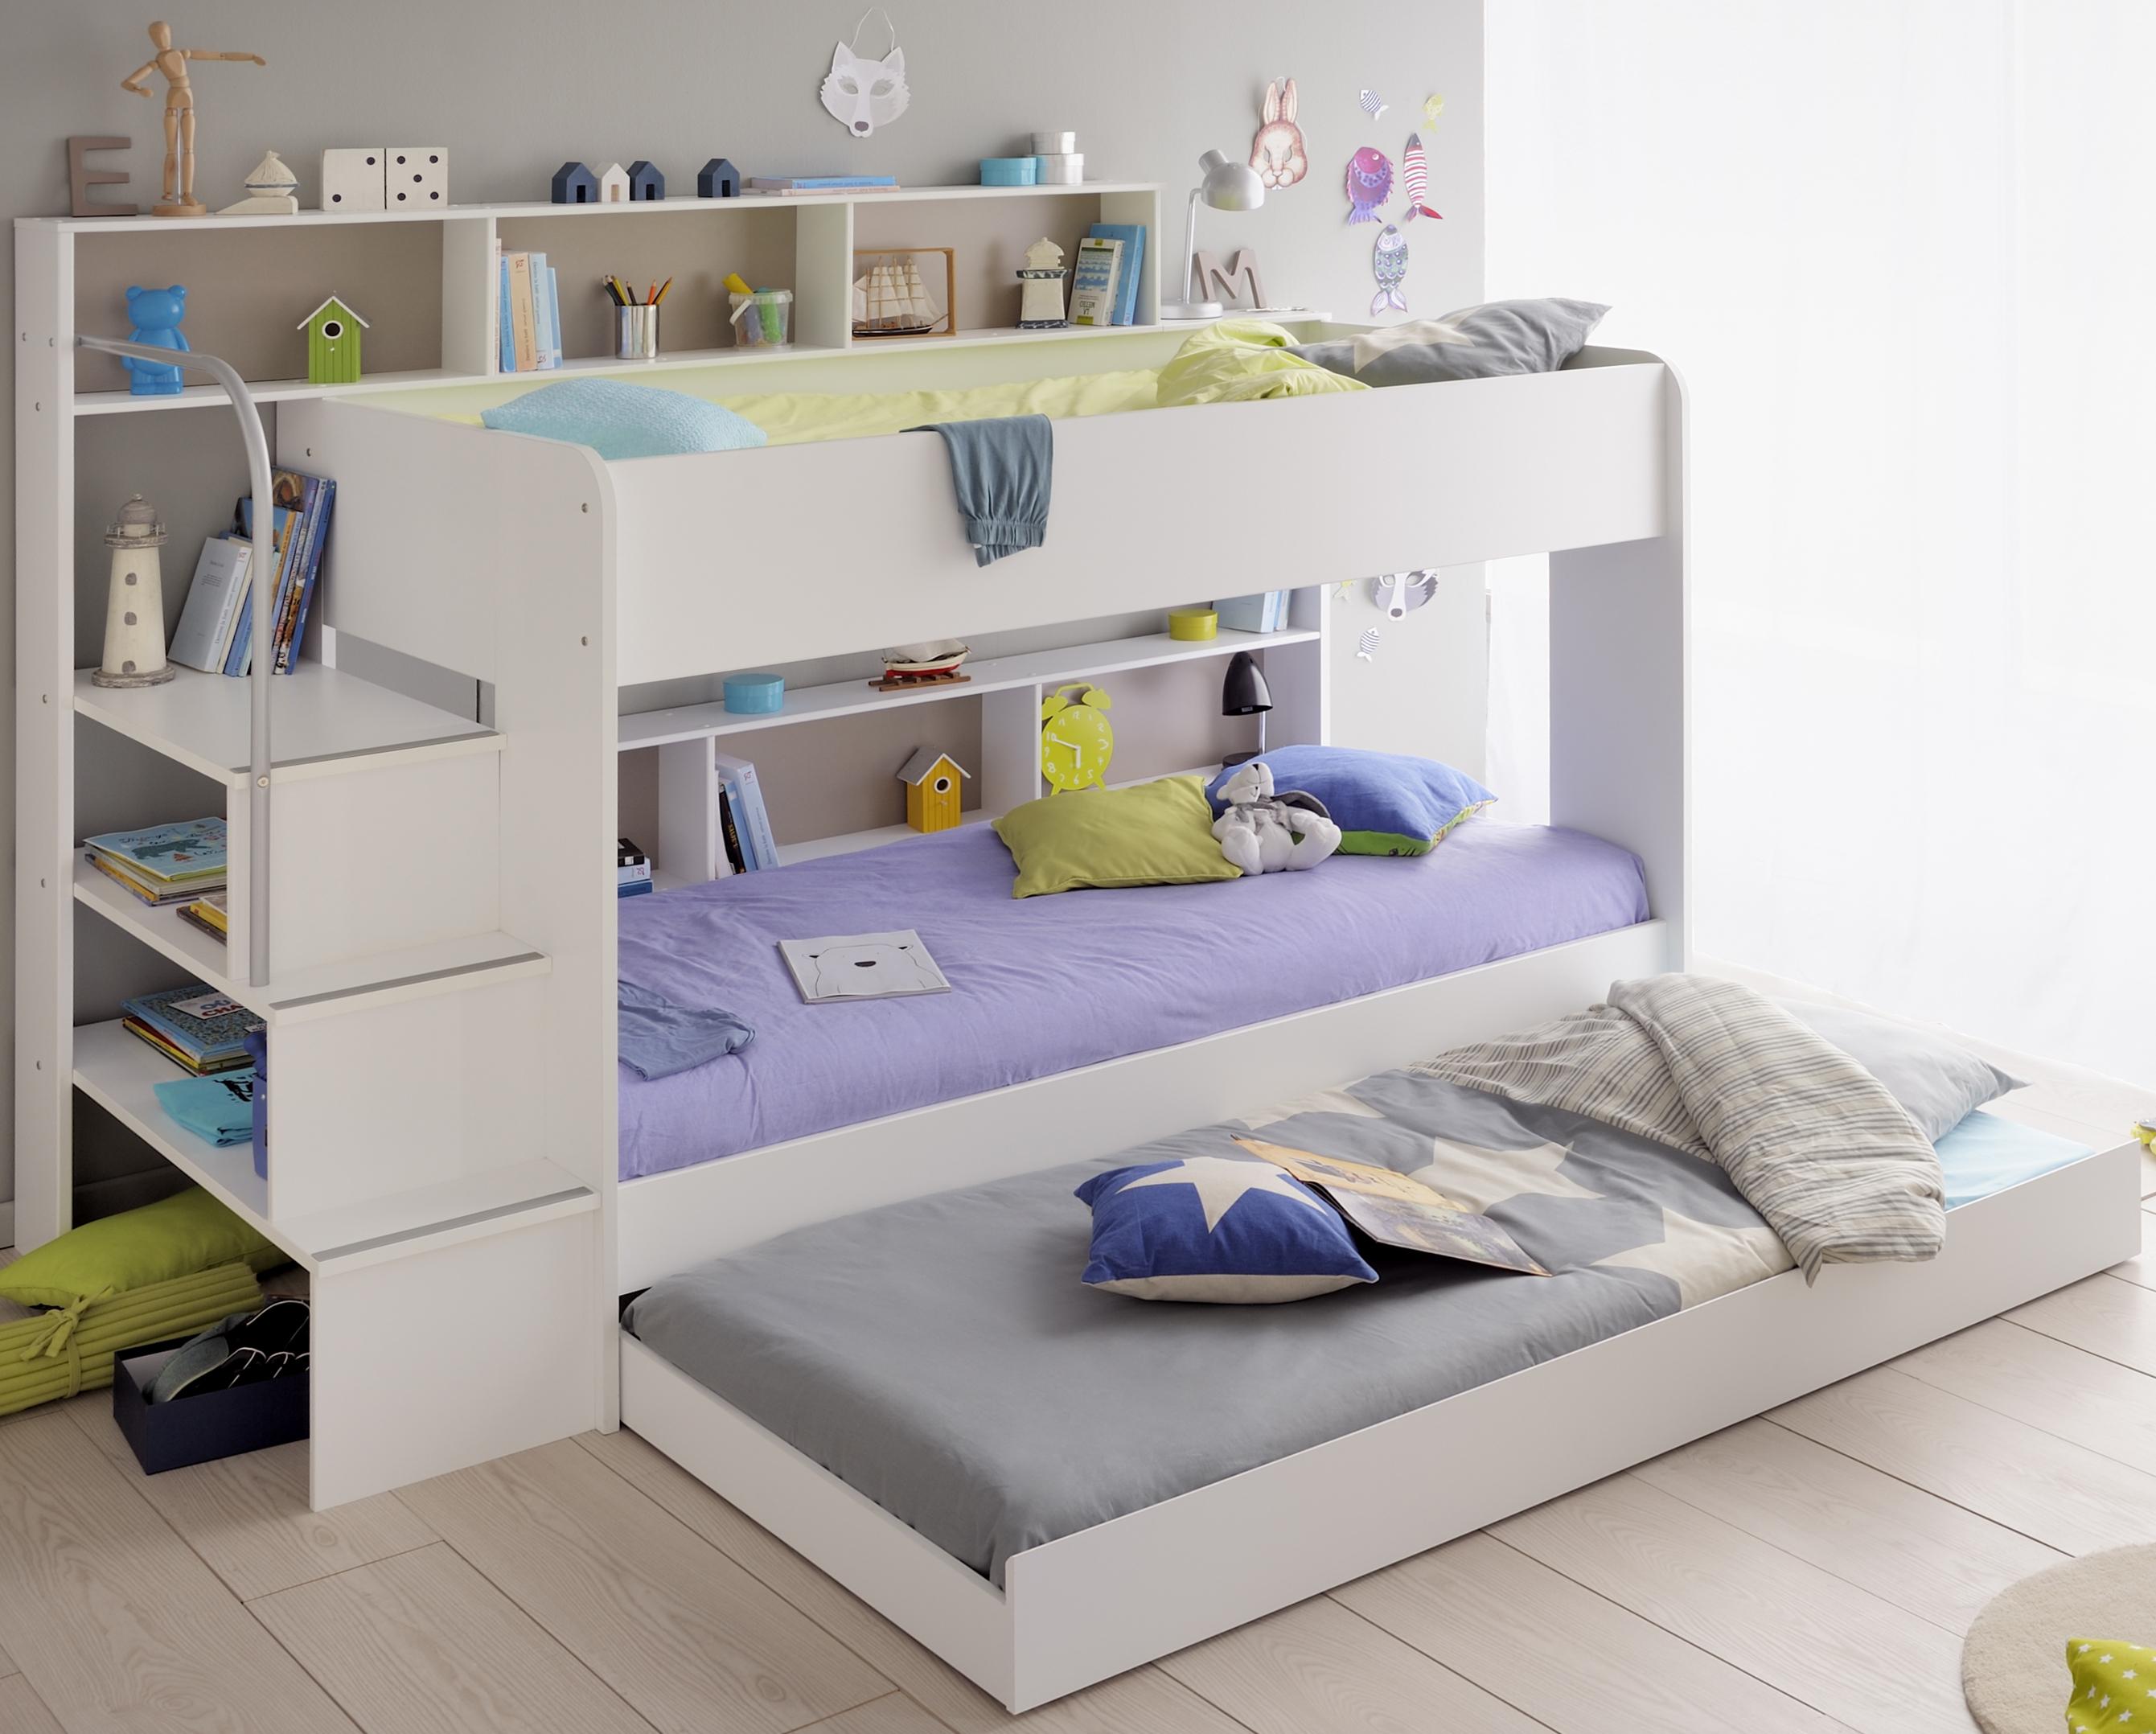 Etagenbett Drei : Kinderzimmer set tlg inkl etagenbett kommode u